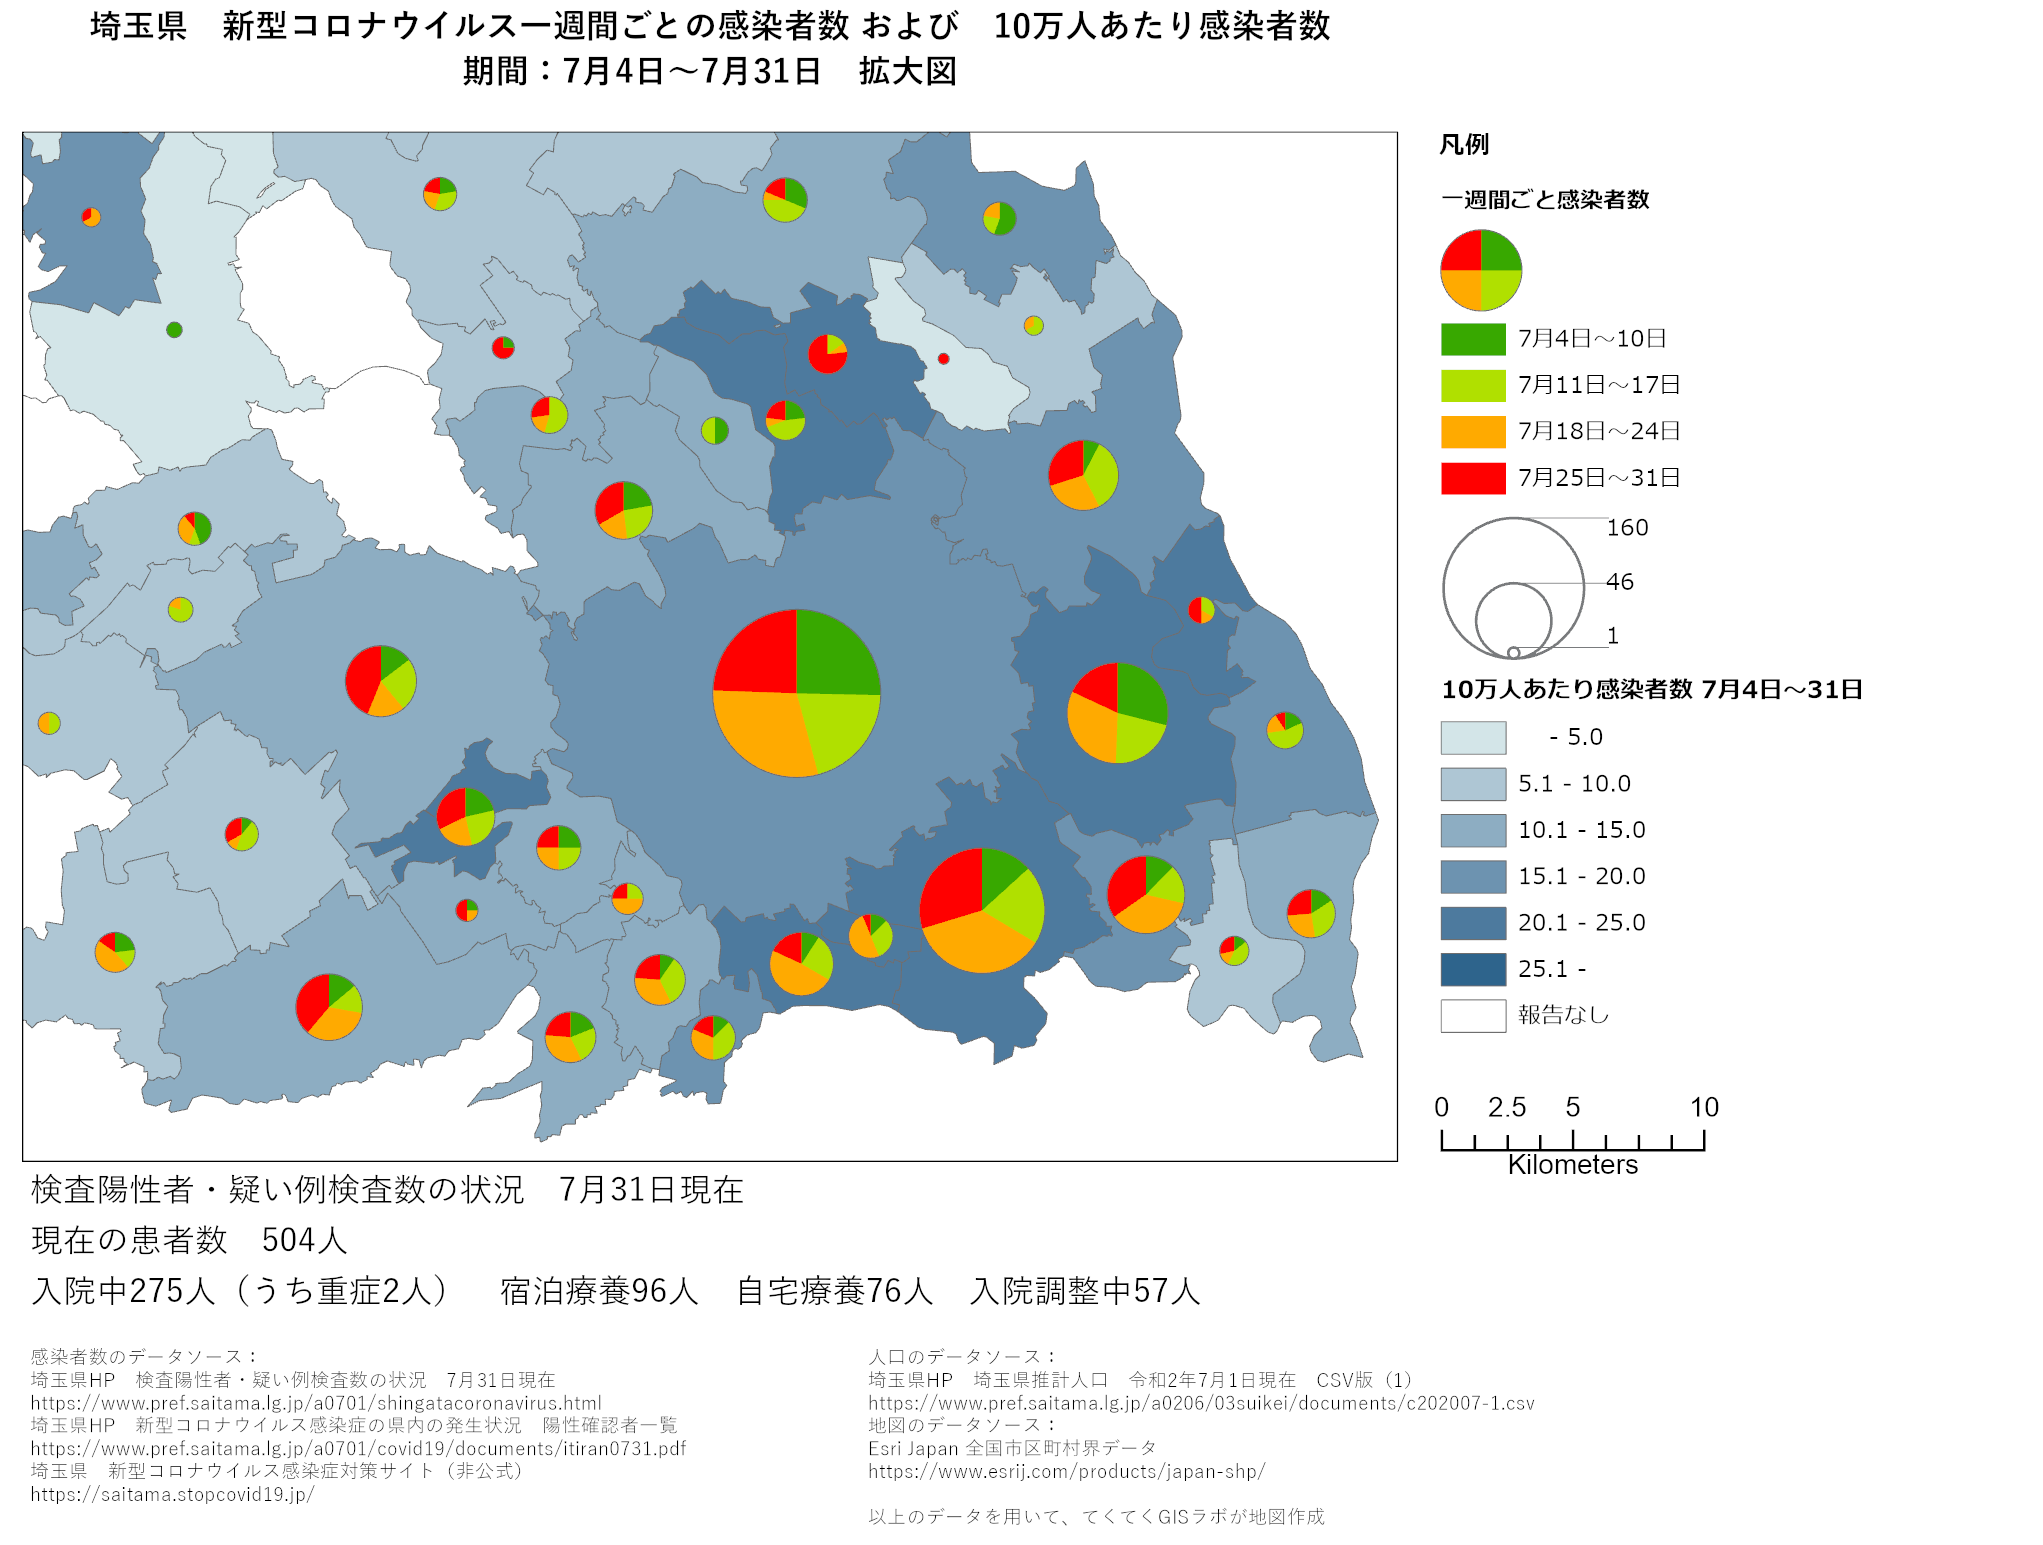 1週間ごと感染者数、埼玉県、7月4日〜7月31日